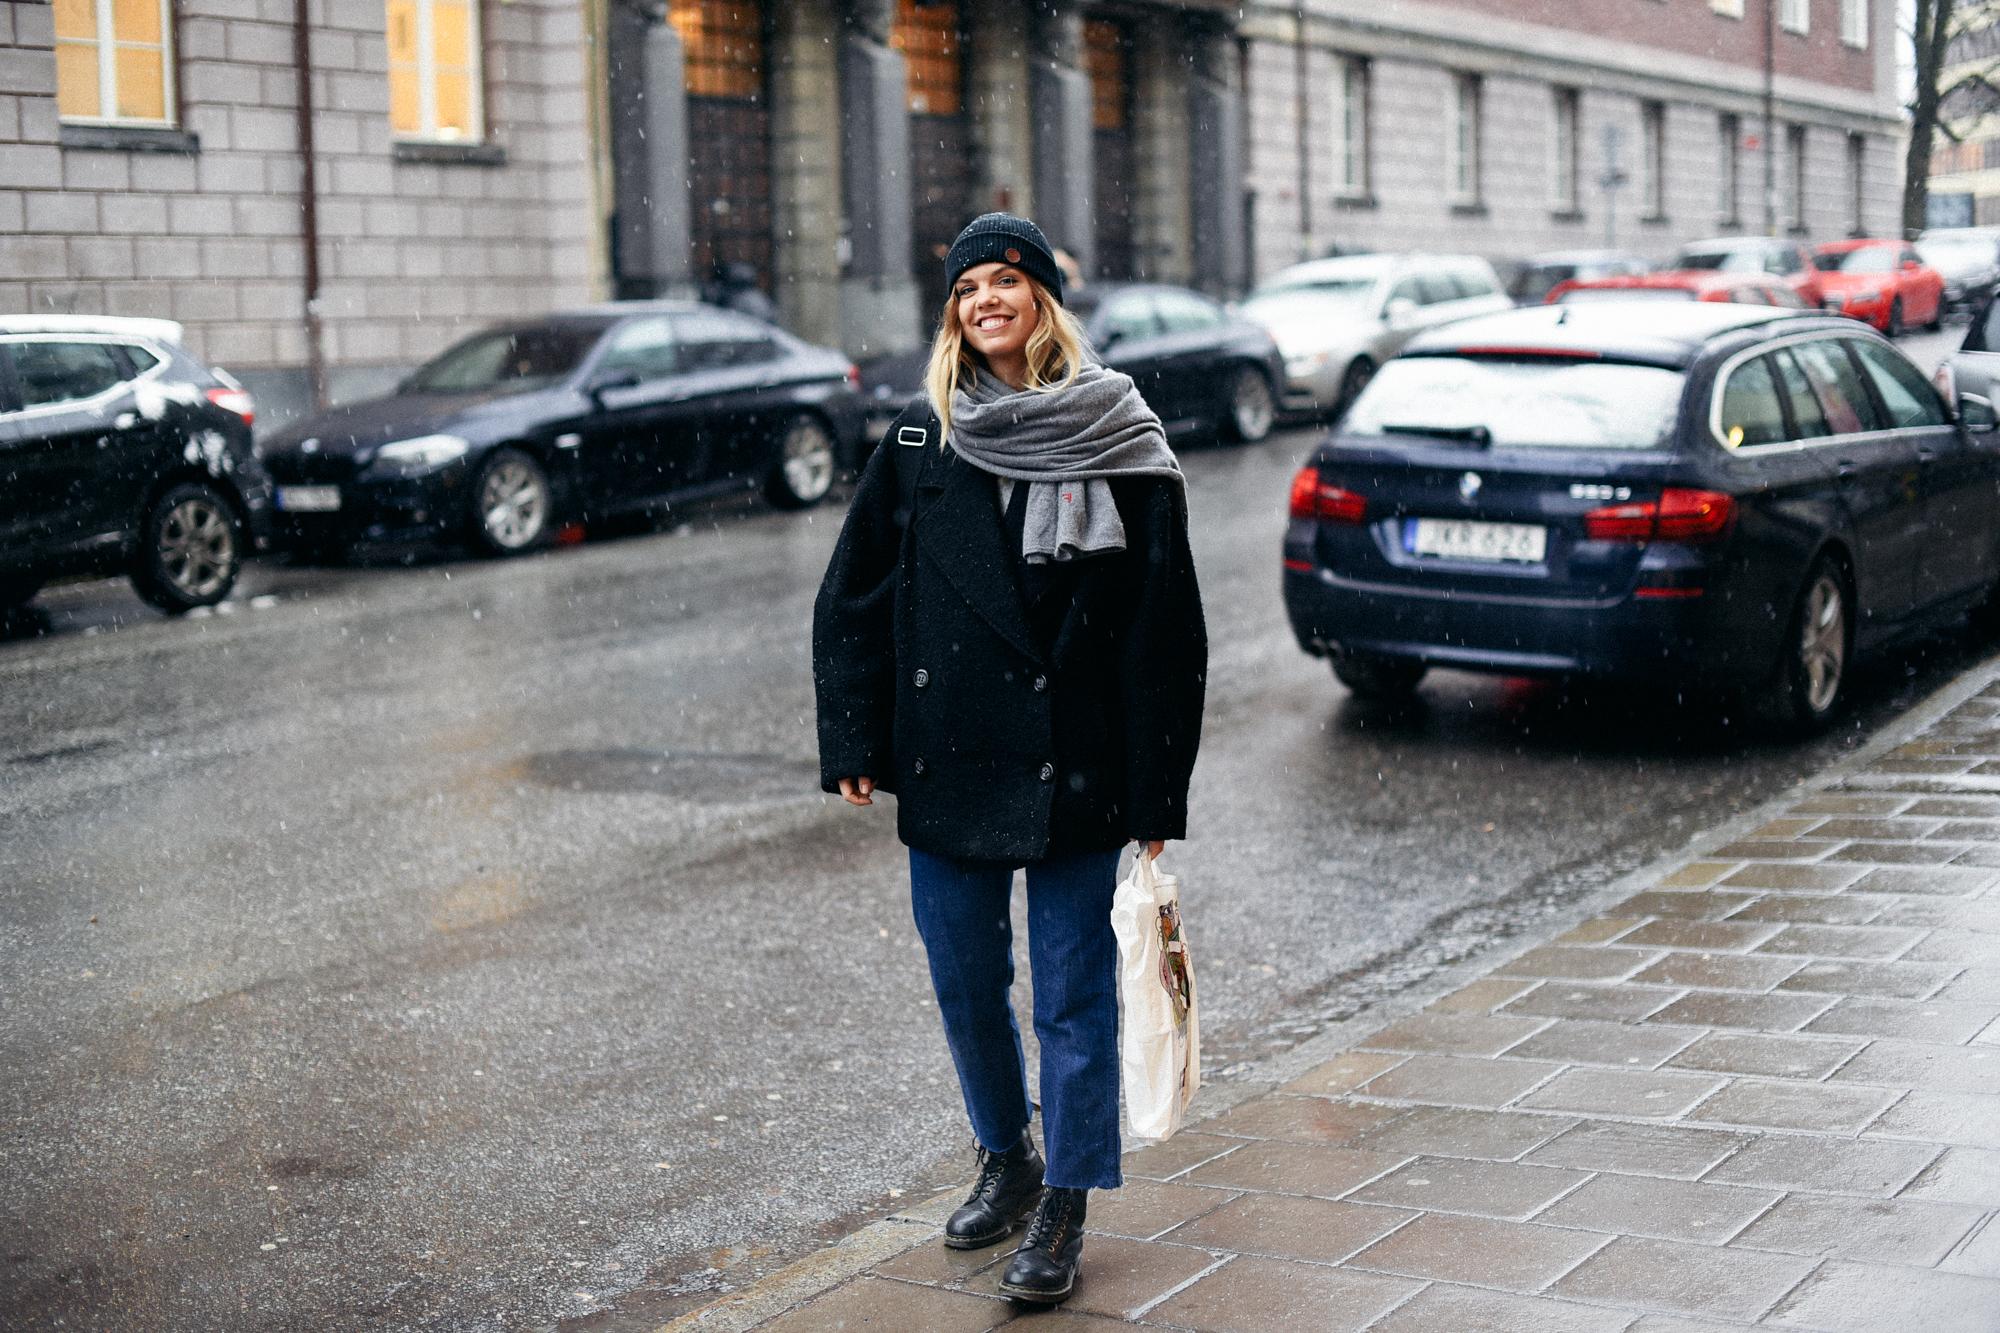 Mitt 2016 i outfits - Flora Wiström - Metro Mode ff7bc51ed4432